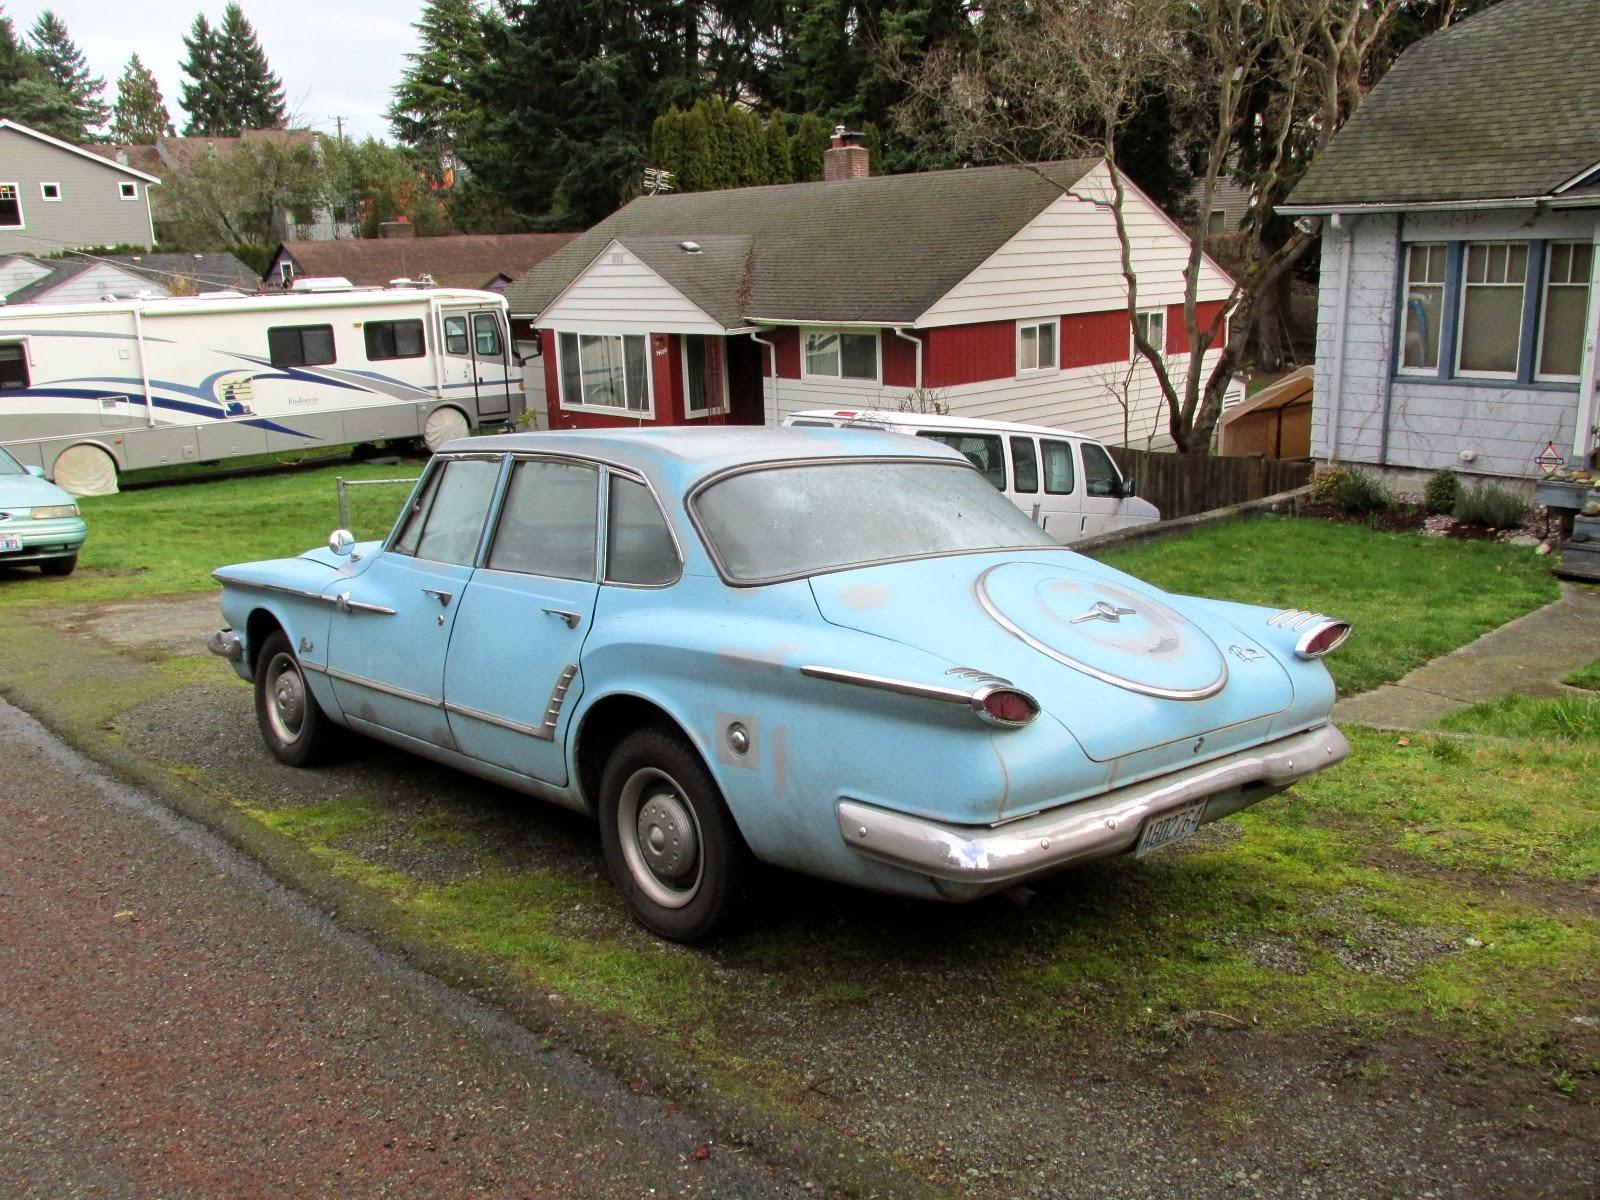 1960 valiant by chrysler 1960 valiant by chrysler 1960s vespa 1961 Car